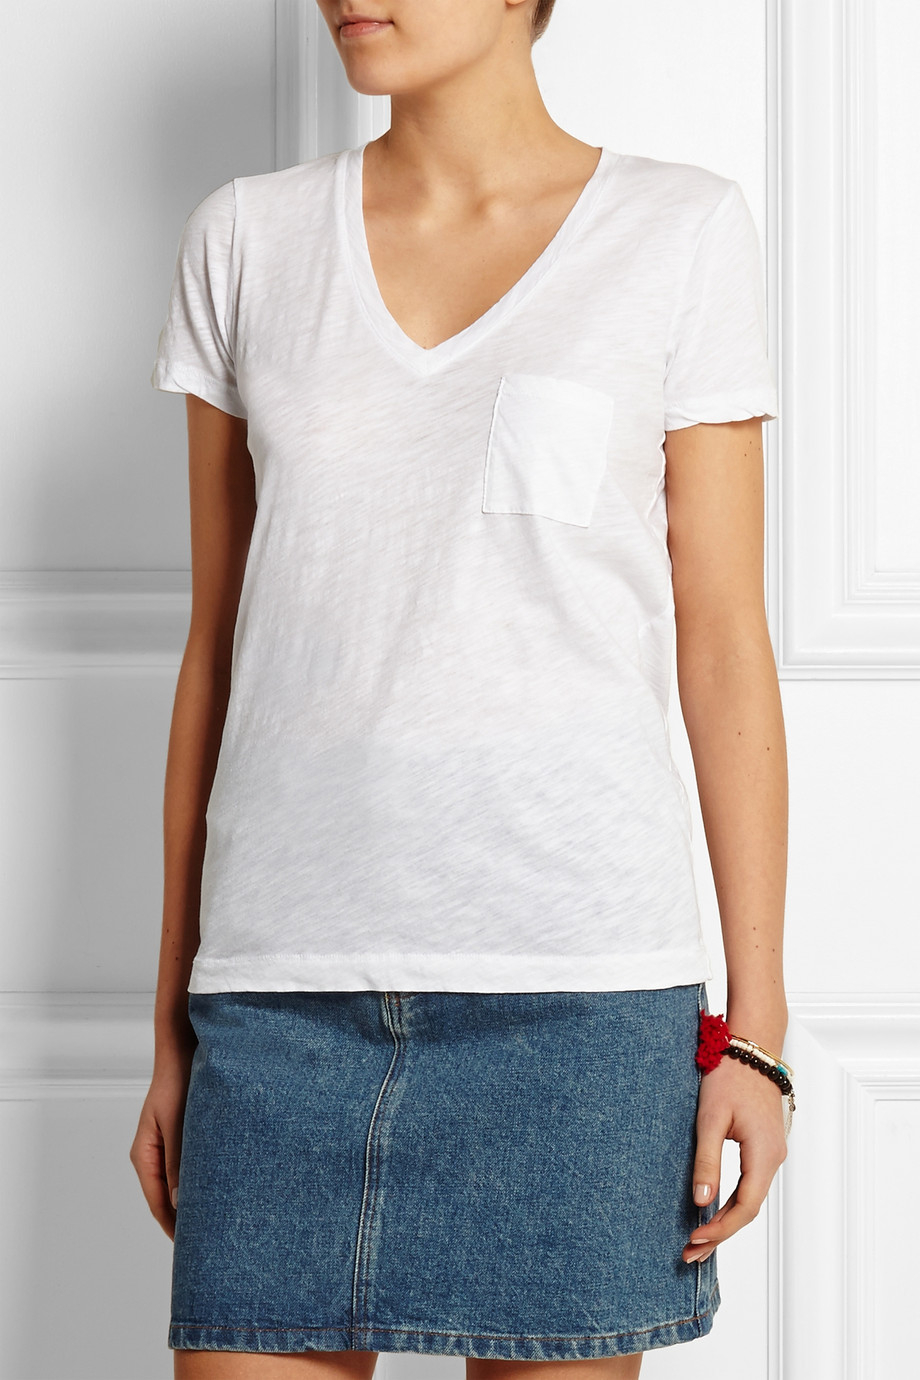 Madewell slub cotton jersey t shirt in white lyst for What is a slub shirt